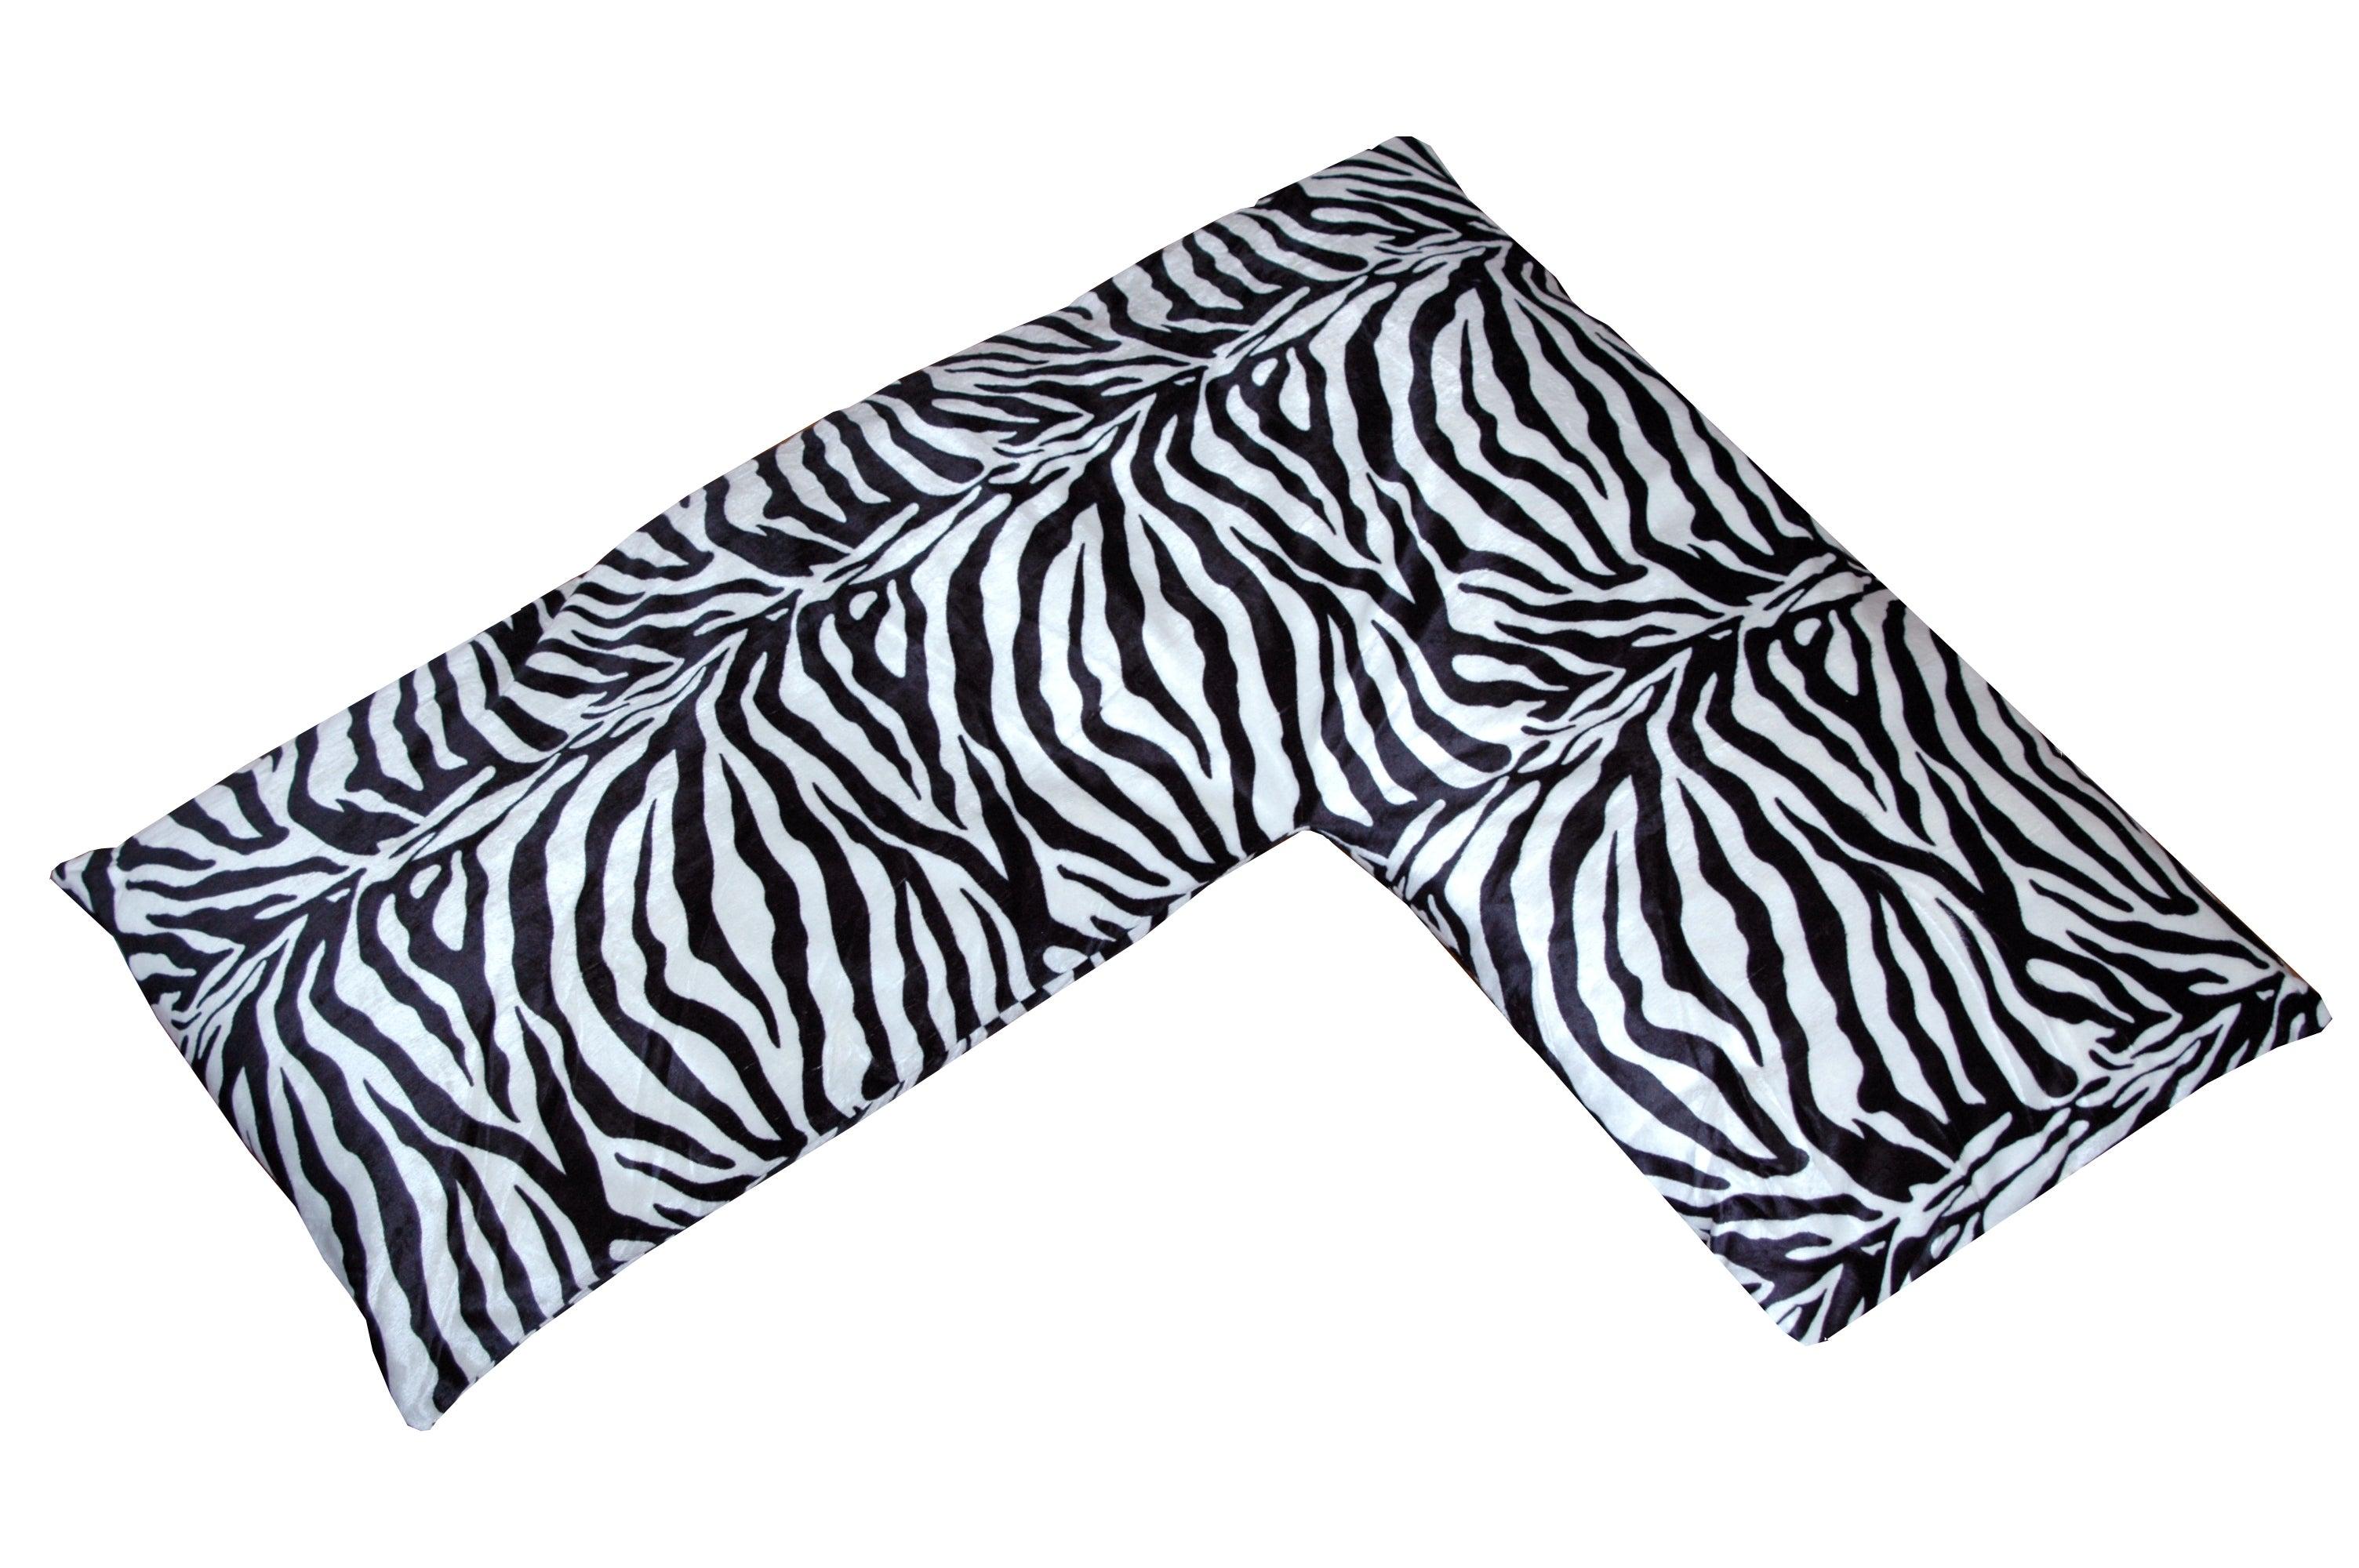 Plush Animal Print L-shaped Body Pillow - Thumbnail 1